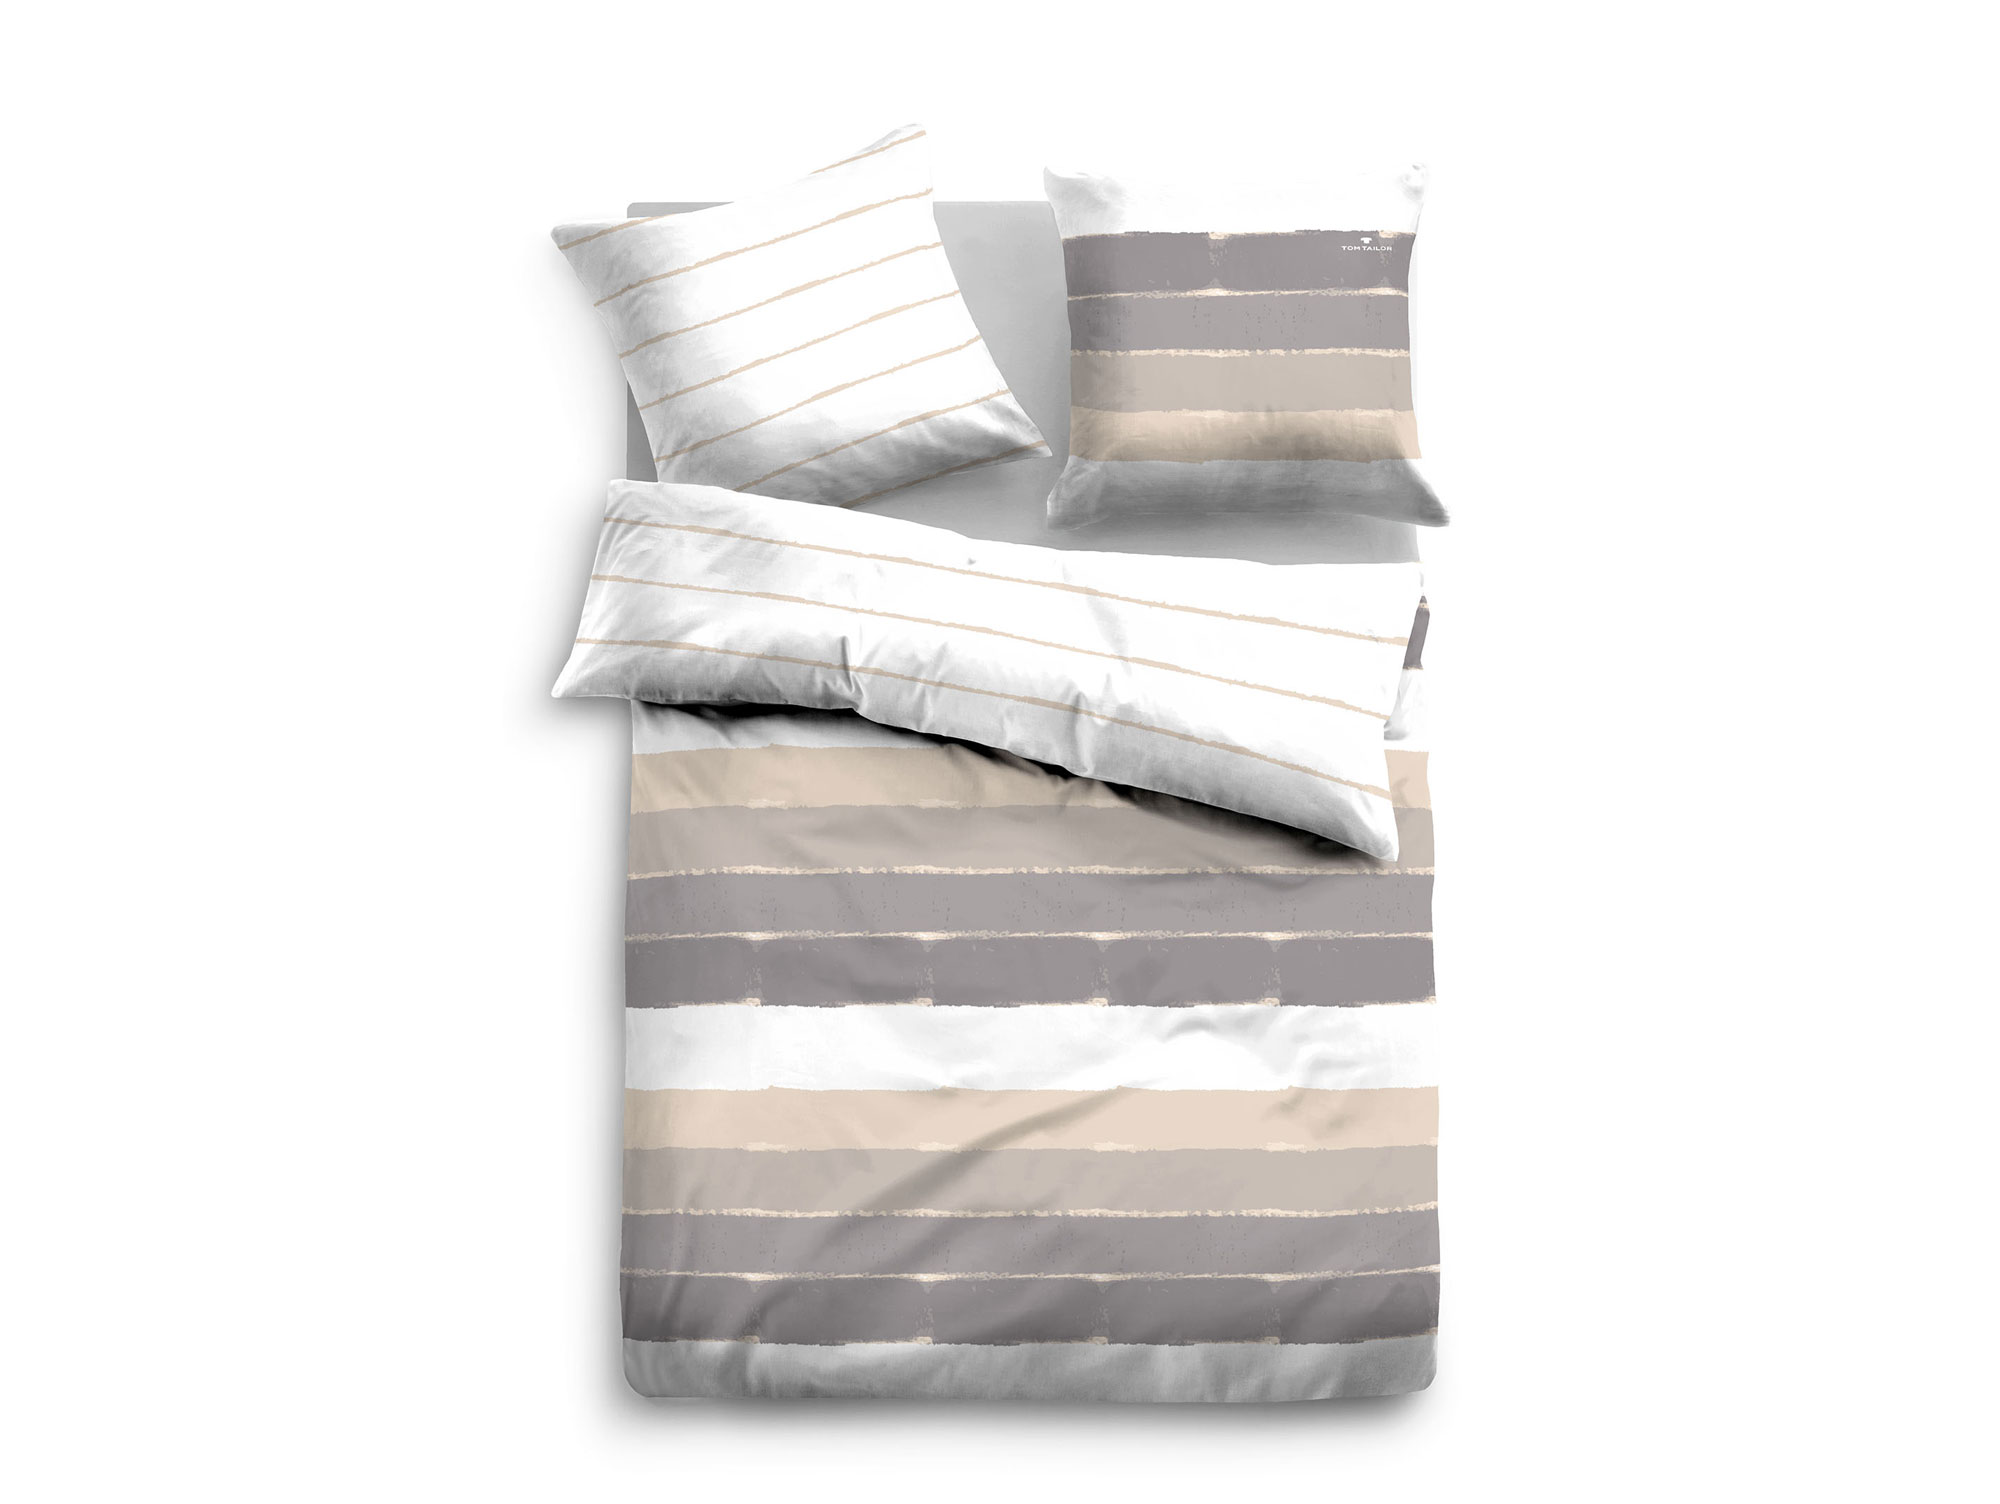 tom tailor bettw sche satin bed linen 135x200 80x80 cm. Black Bedroom Furniture Sets. Home Design Ideas